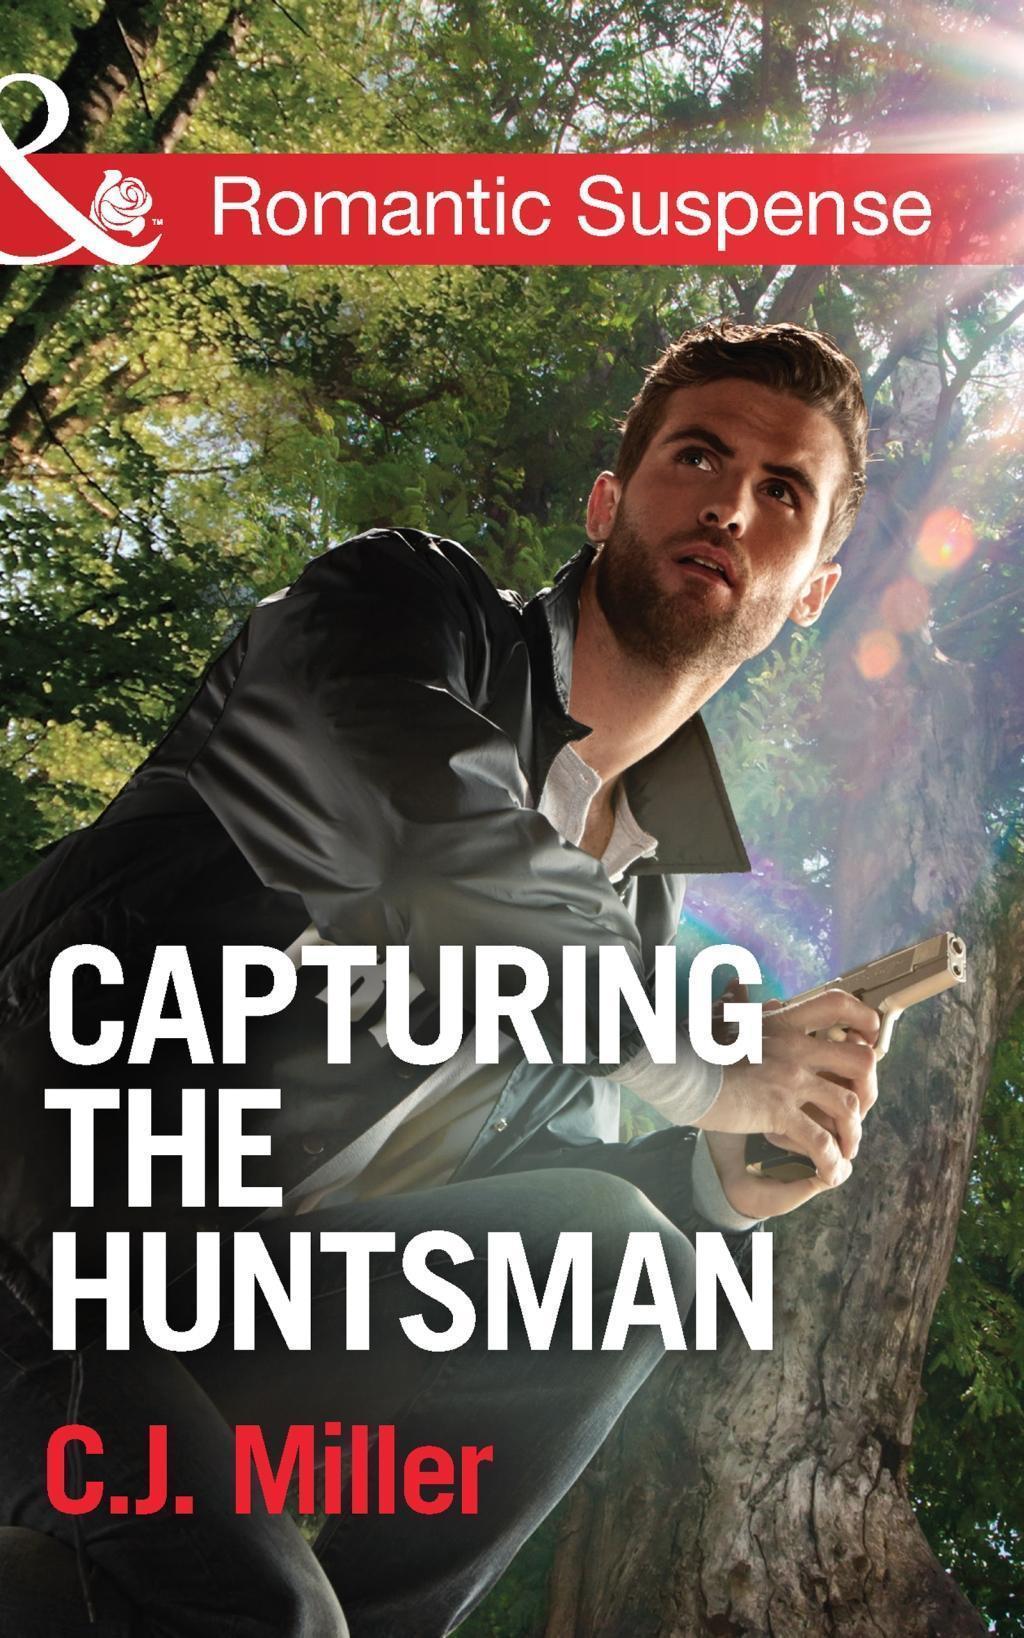 Capturing the Huntsman (Mills & Boon Romantic Suspense)